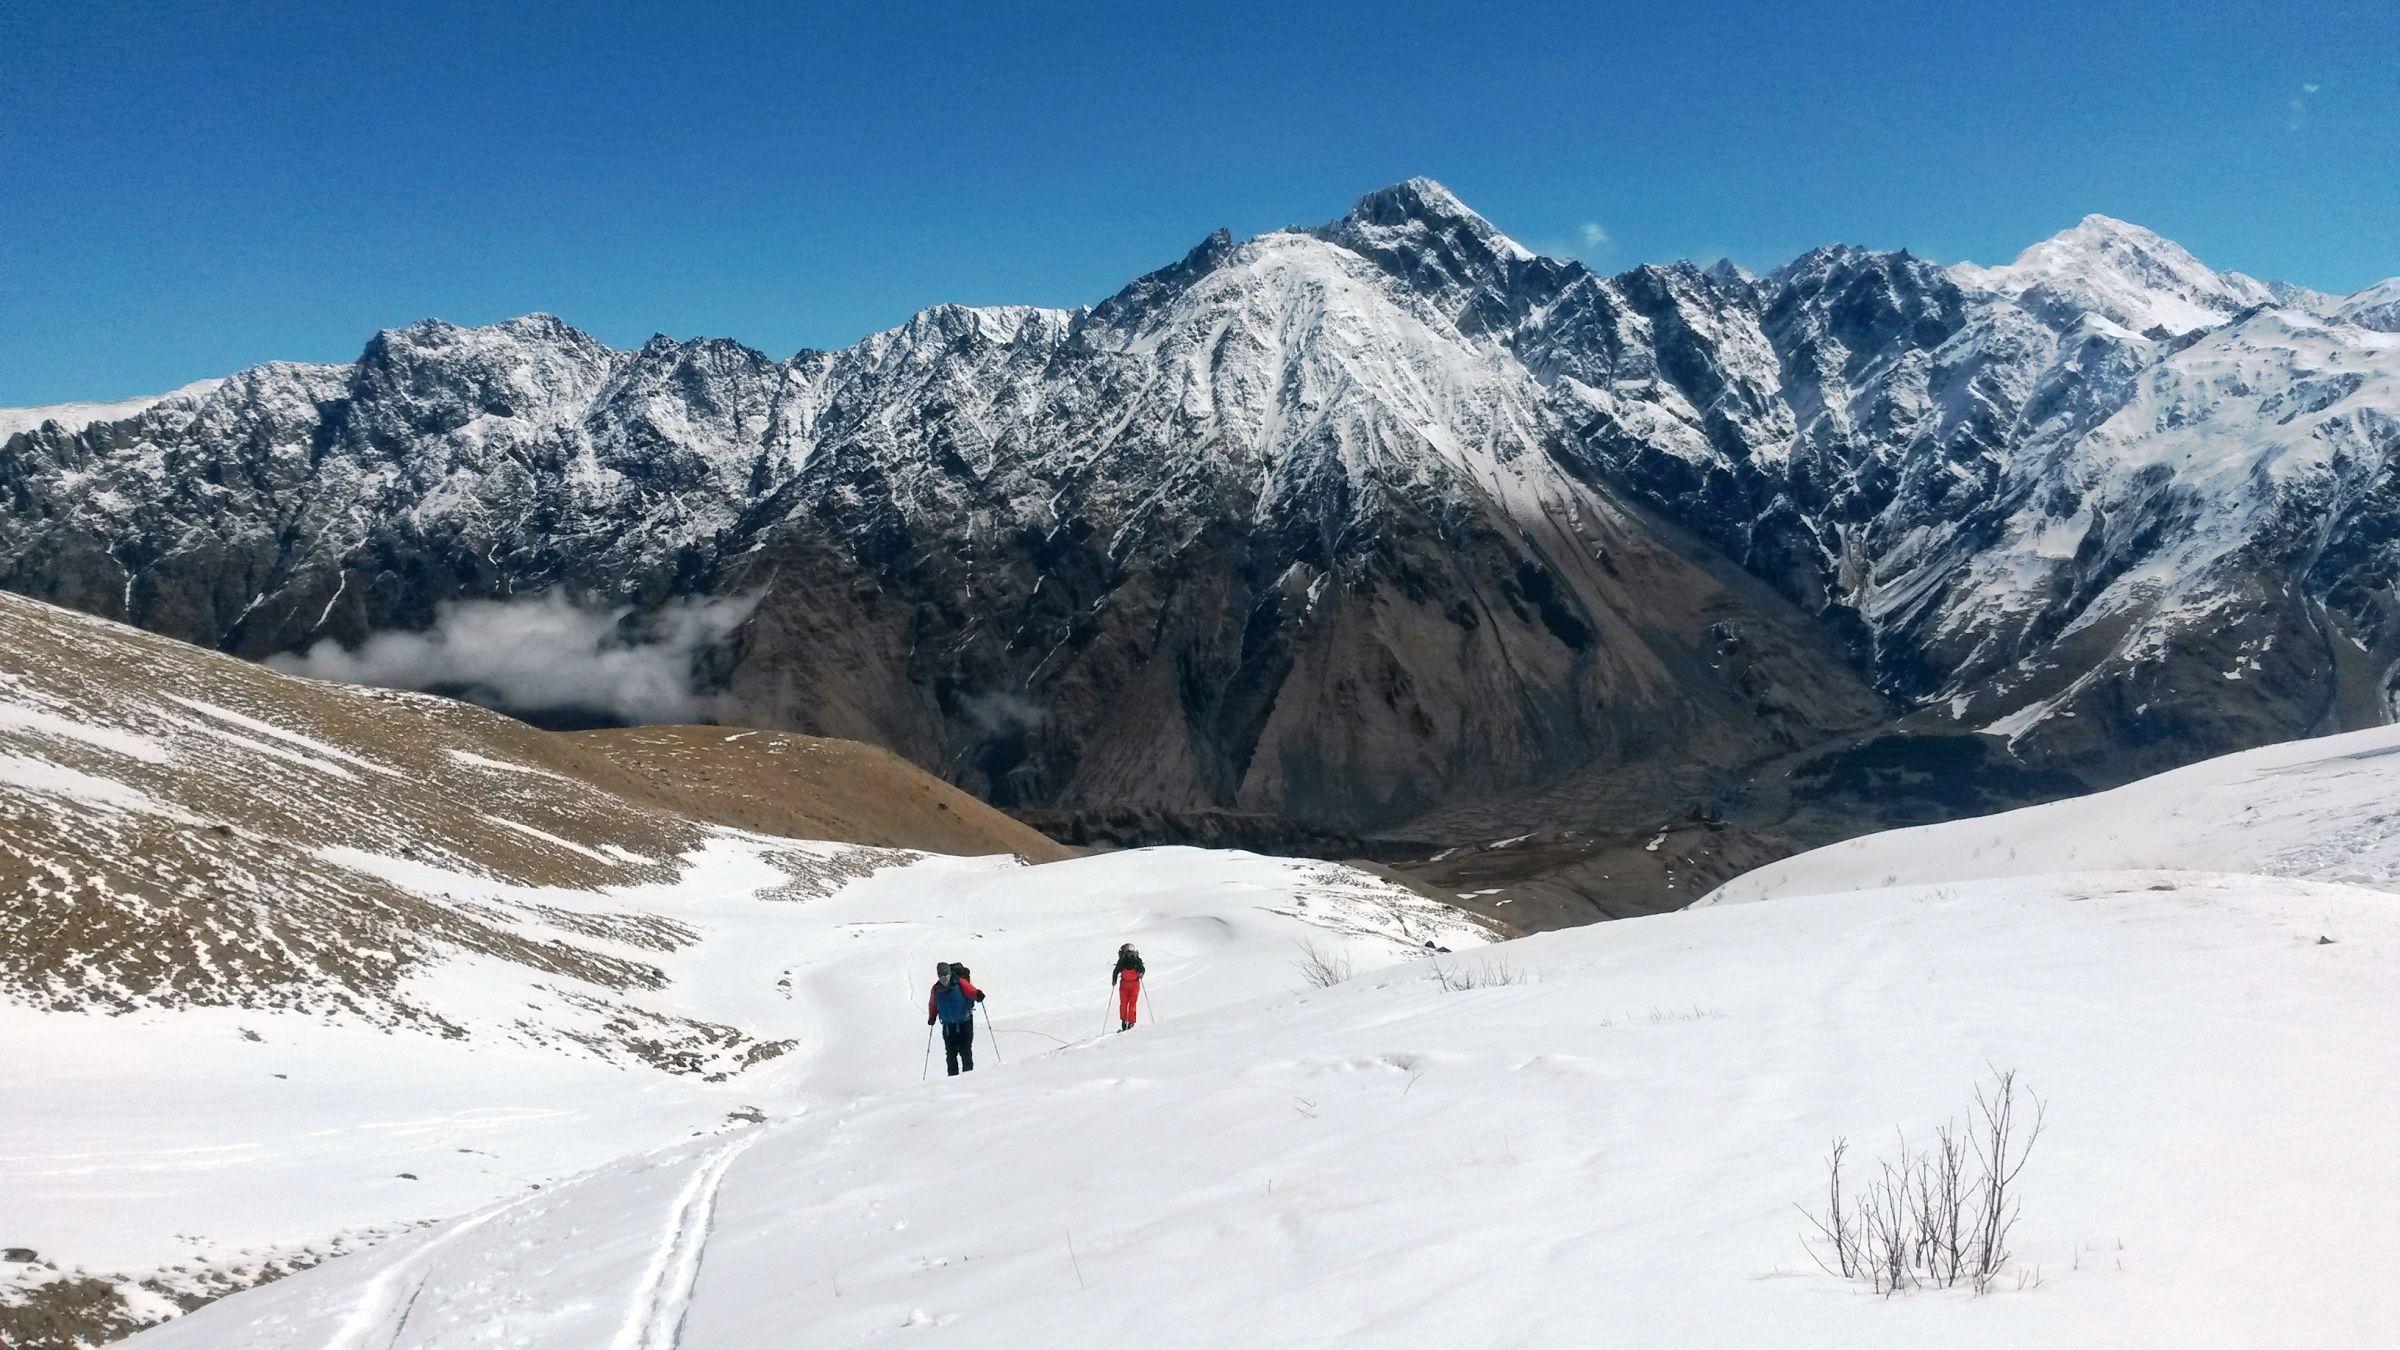 Ски-тур на Казбеке: снежный след